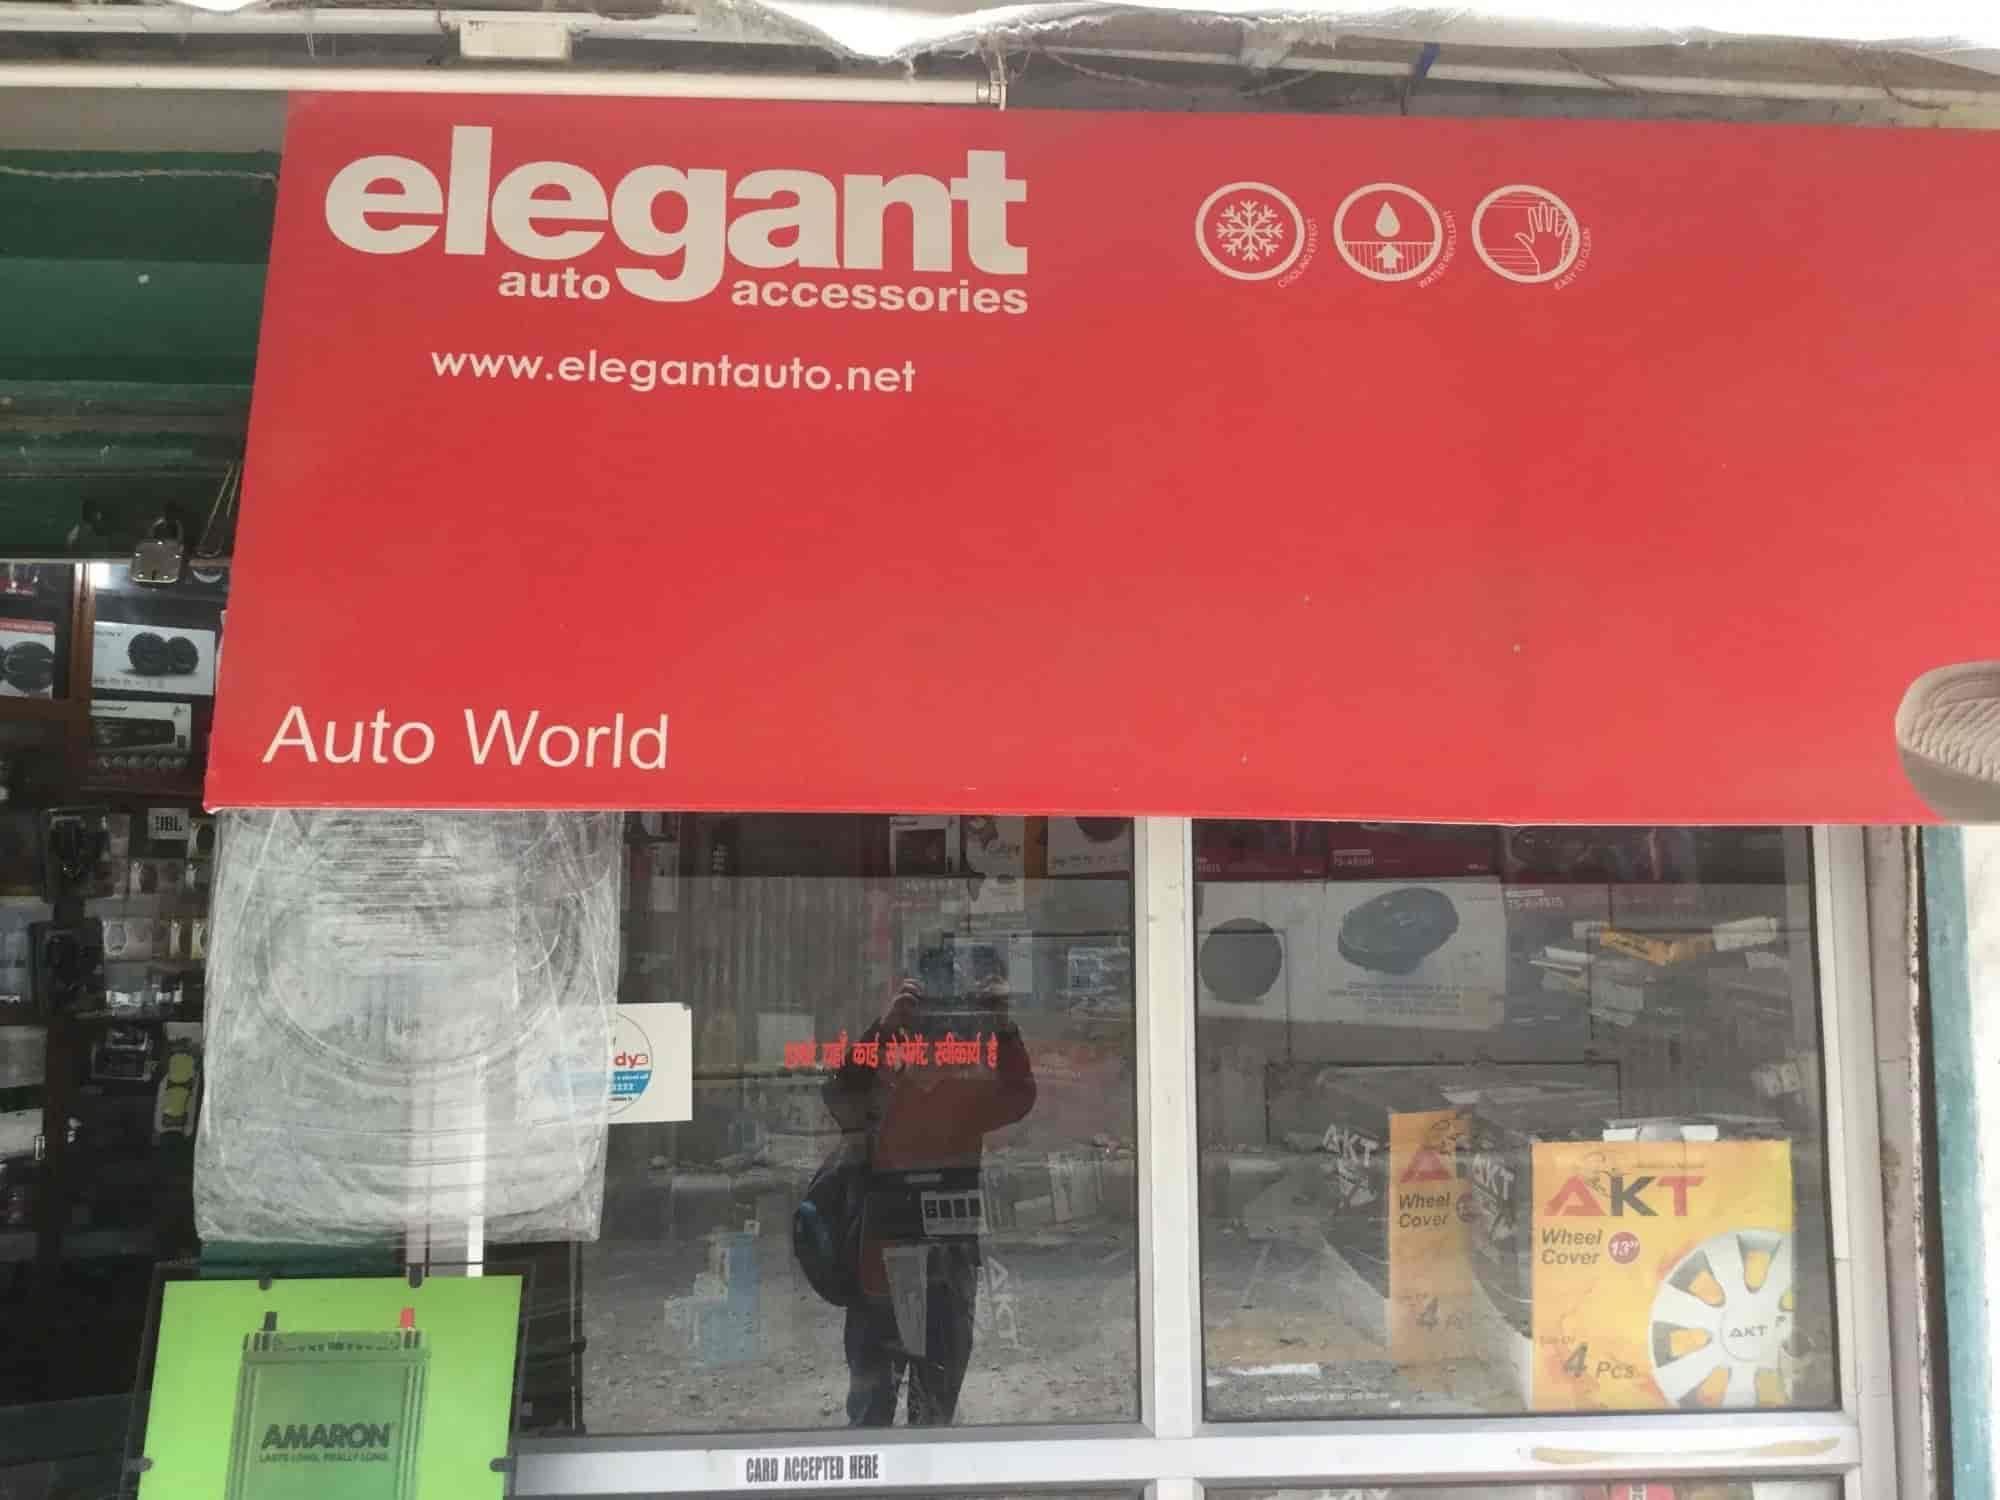 Auto World Car Accessories Photos, Ballupur, Dehradun- Pictures ...